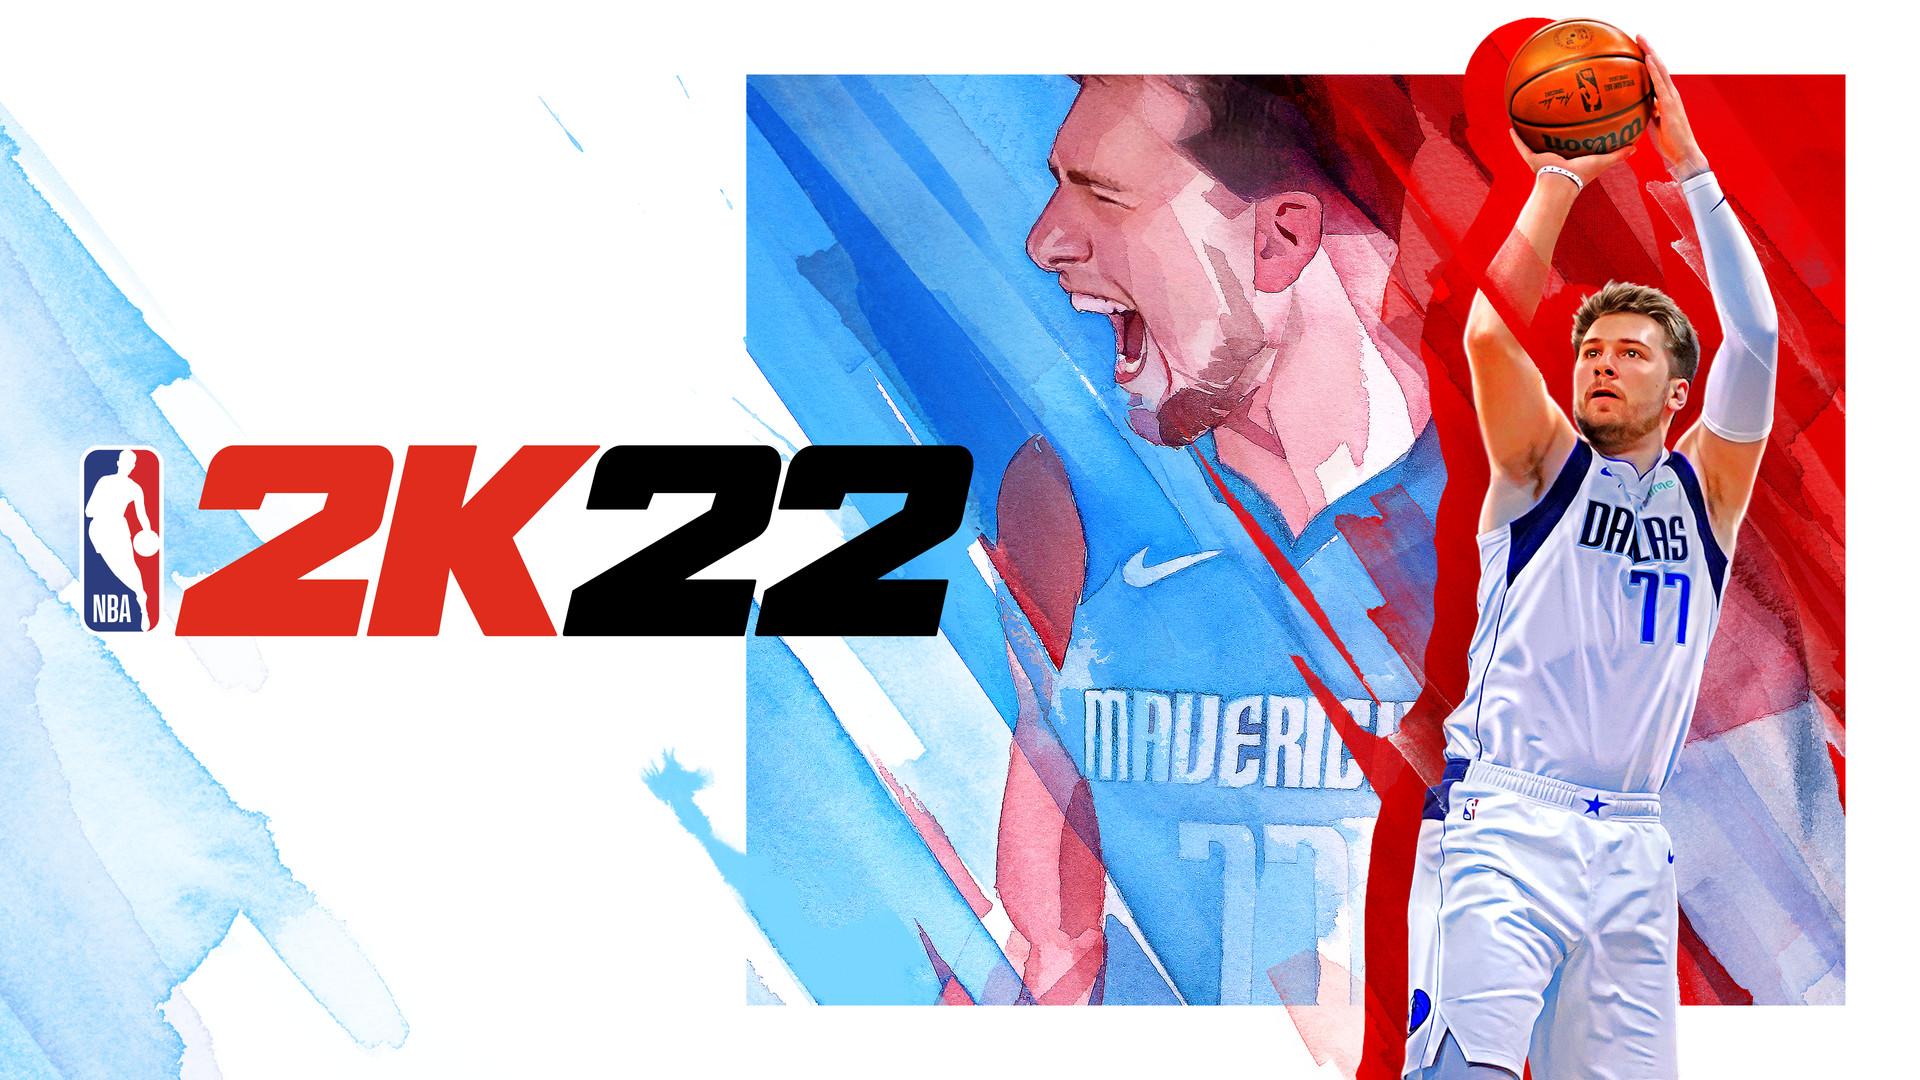 NBA 2K22 Luka Doncic cover